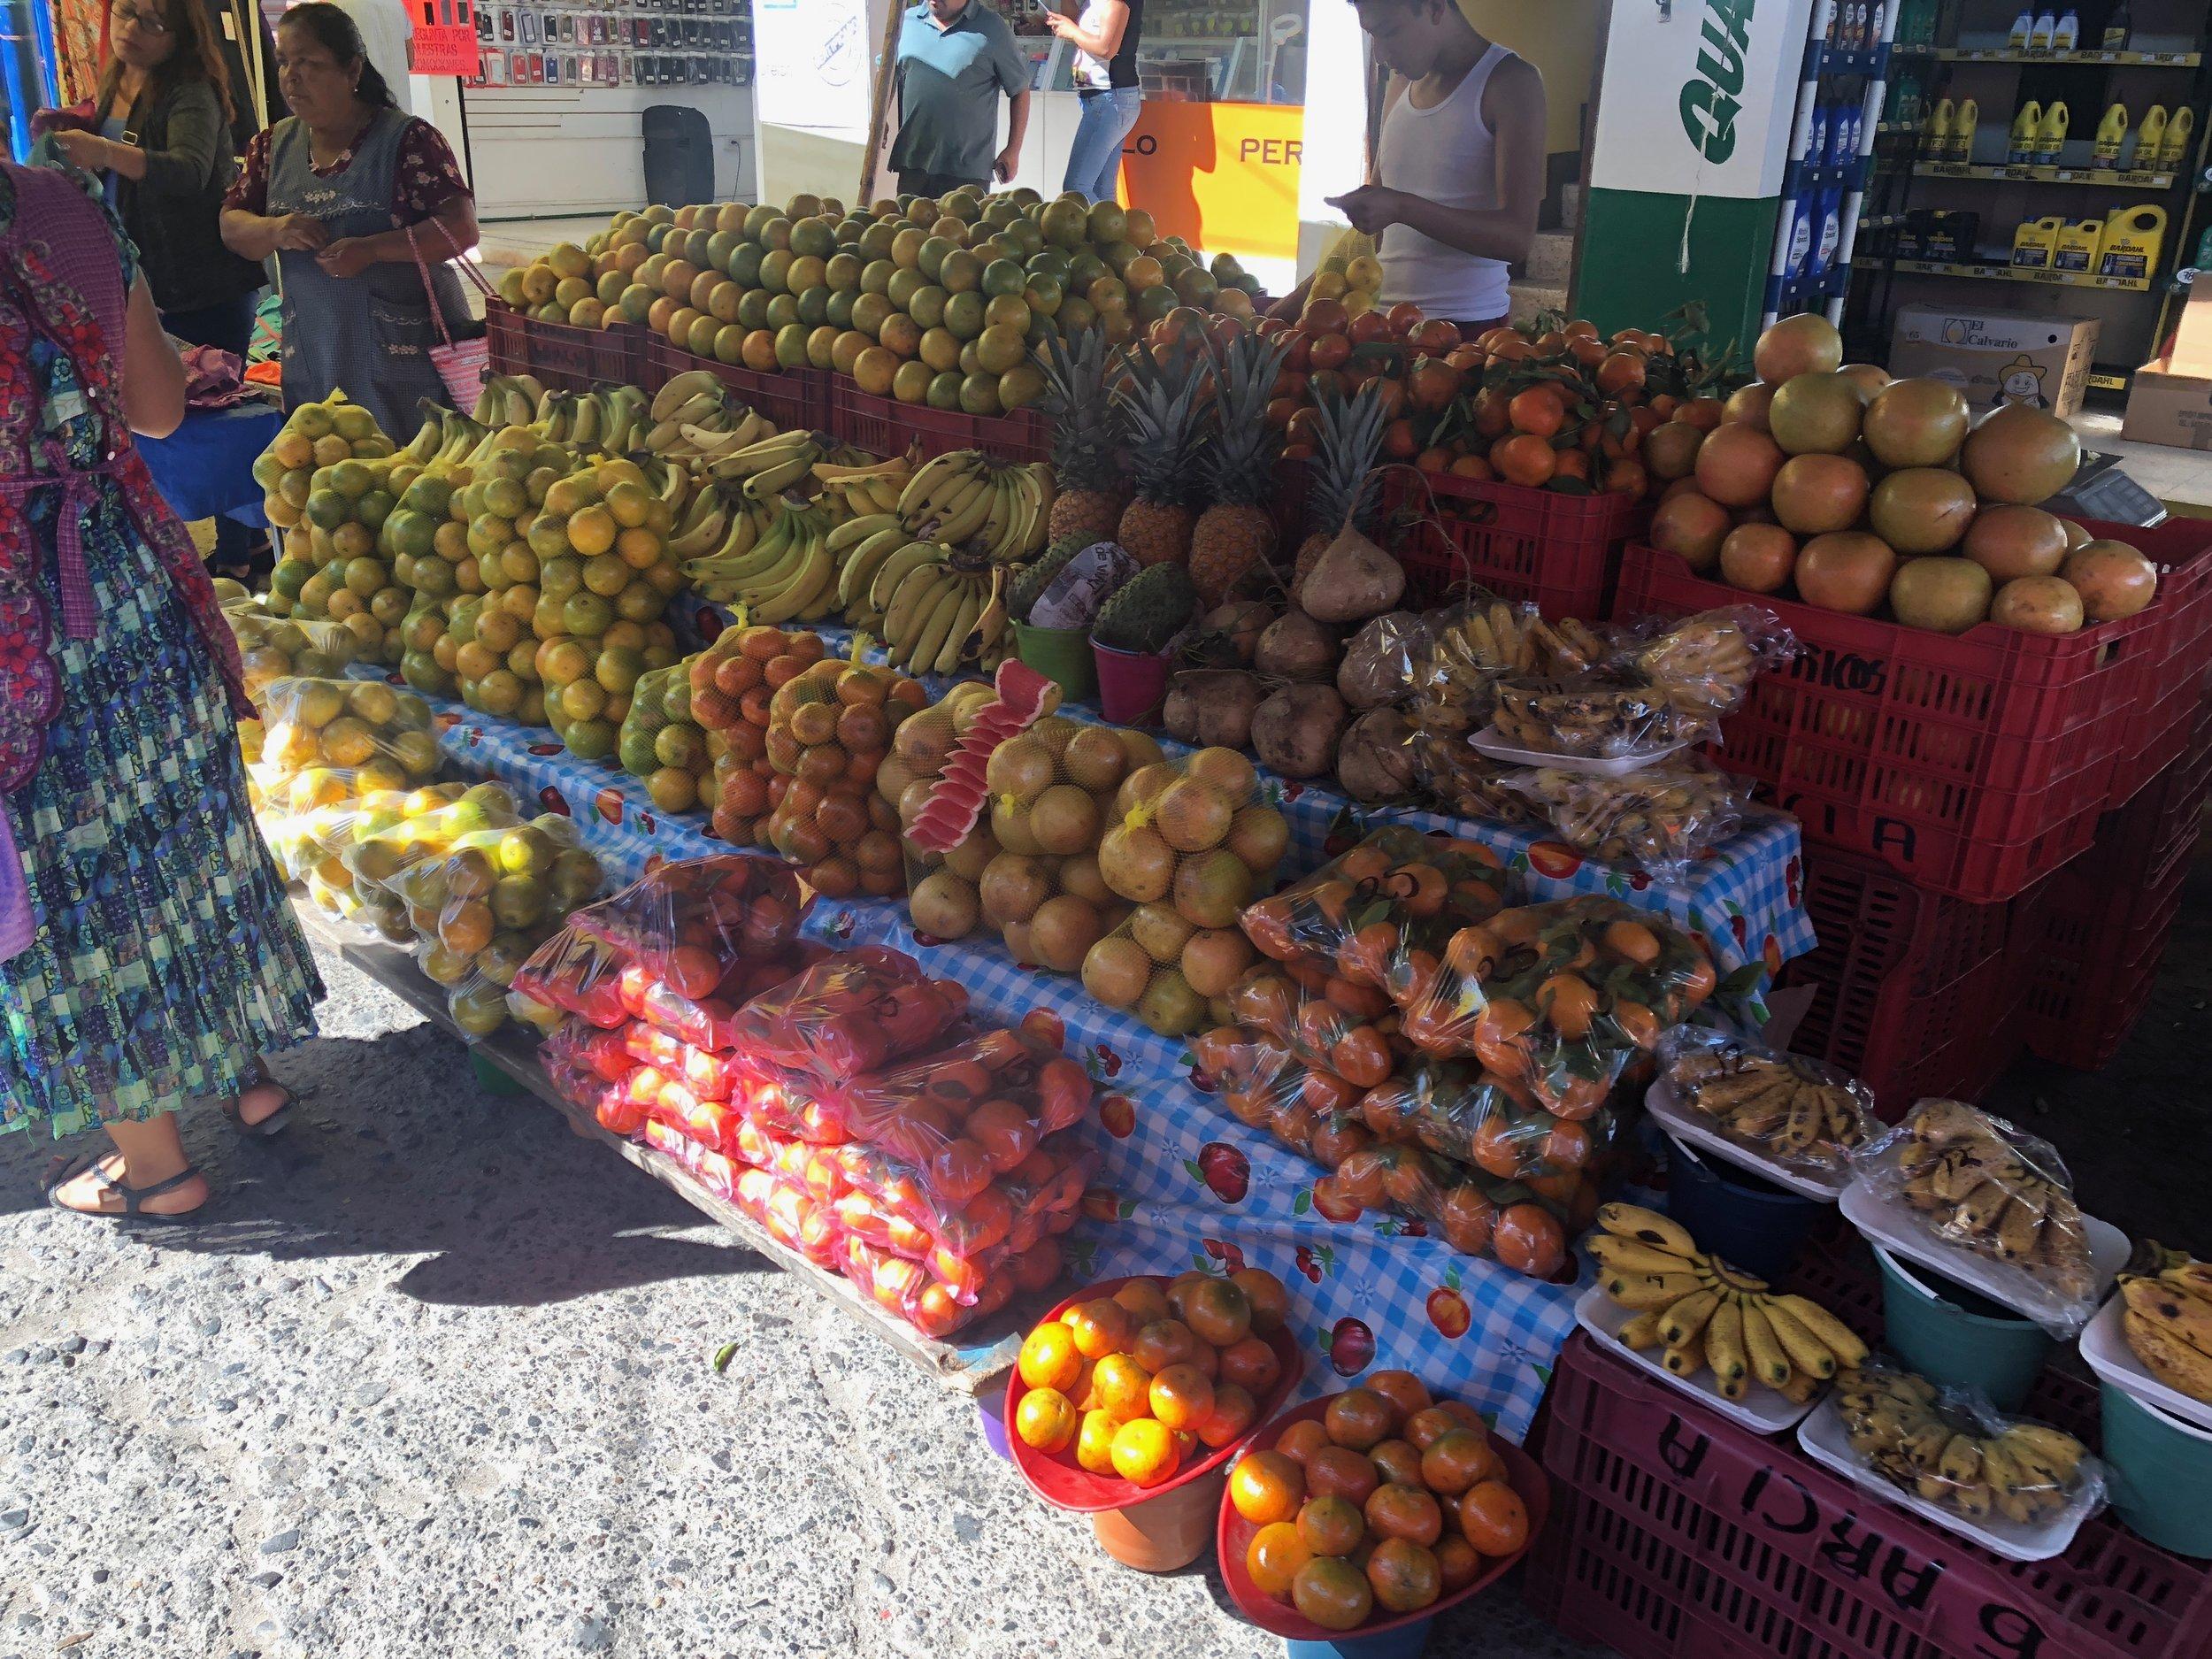 At the Tlacolula Market